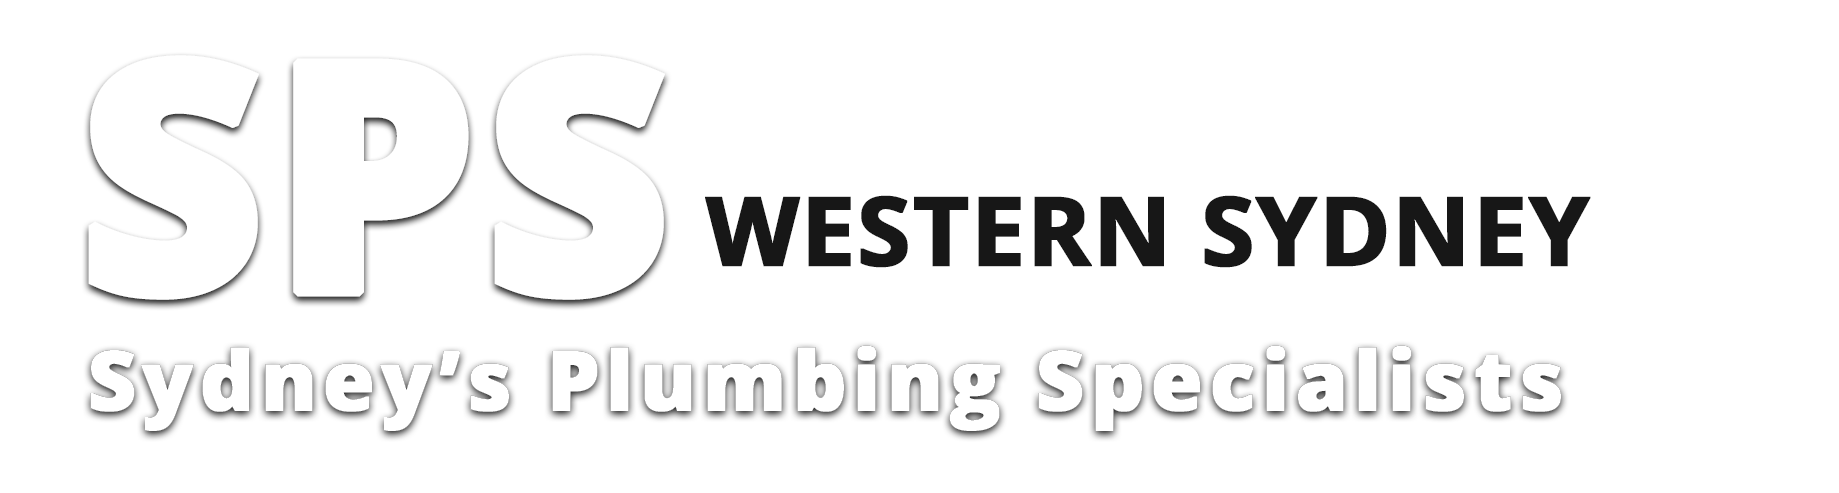 SPS Sydney's Plumbing Specialists